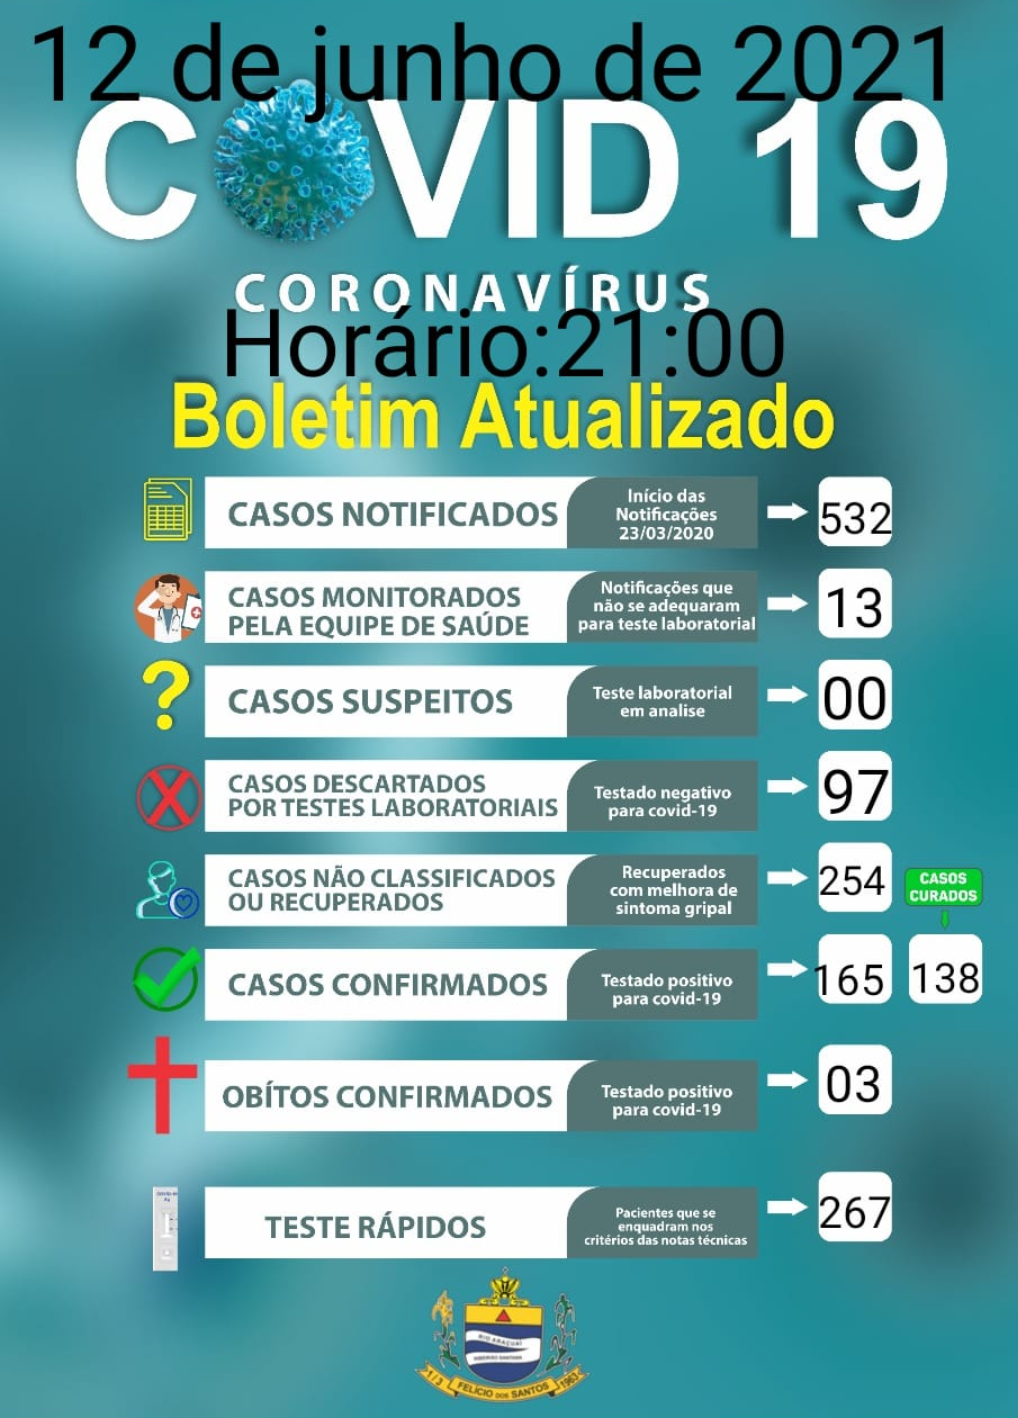 Boletim covid-19,12 de junho de 2021